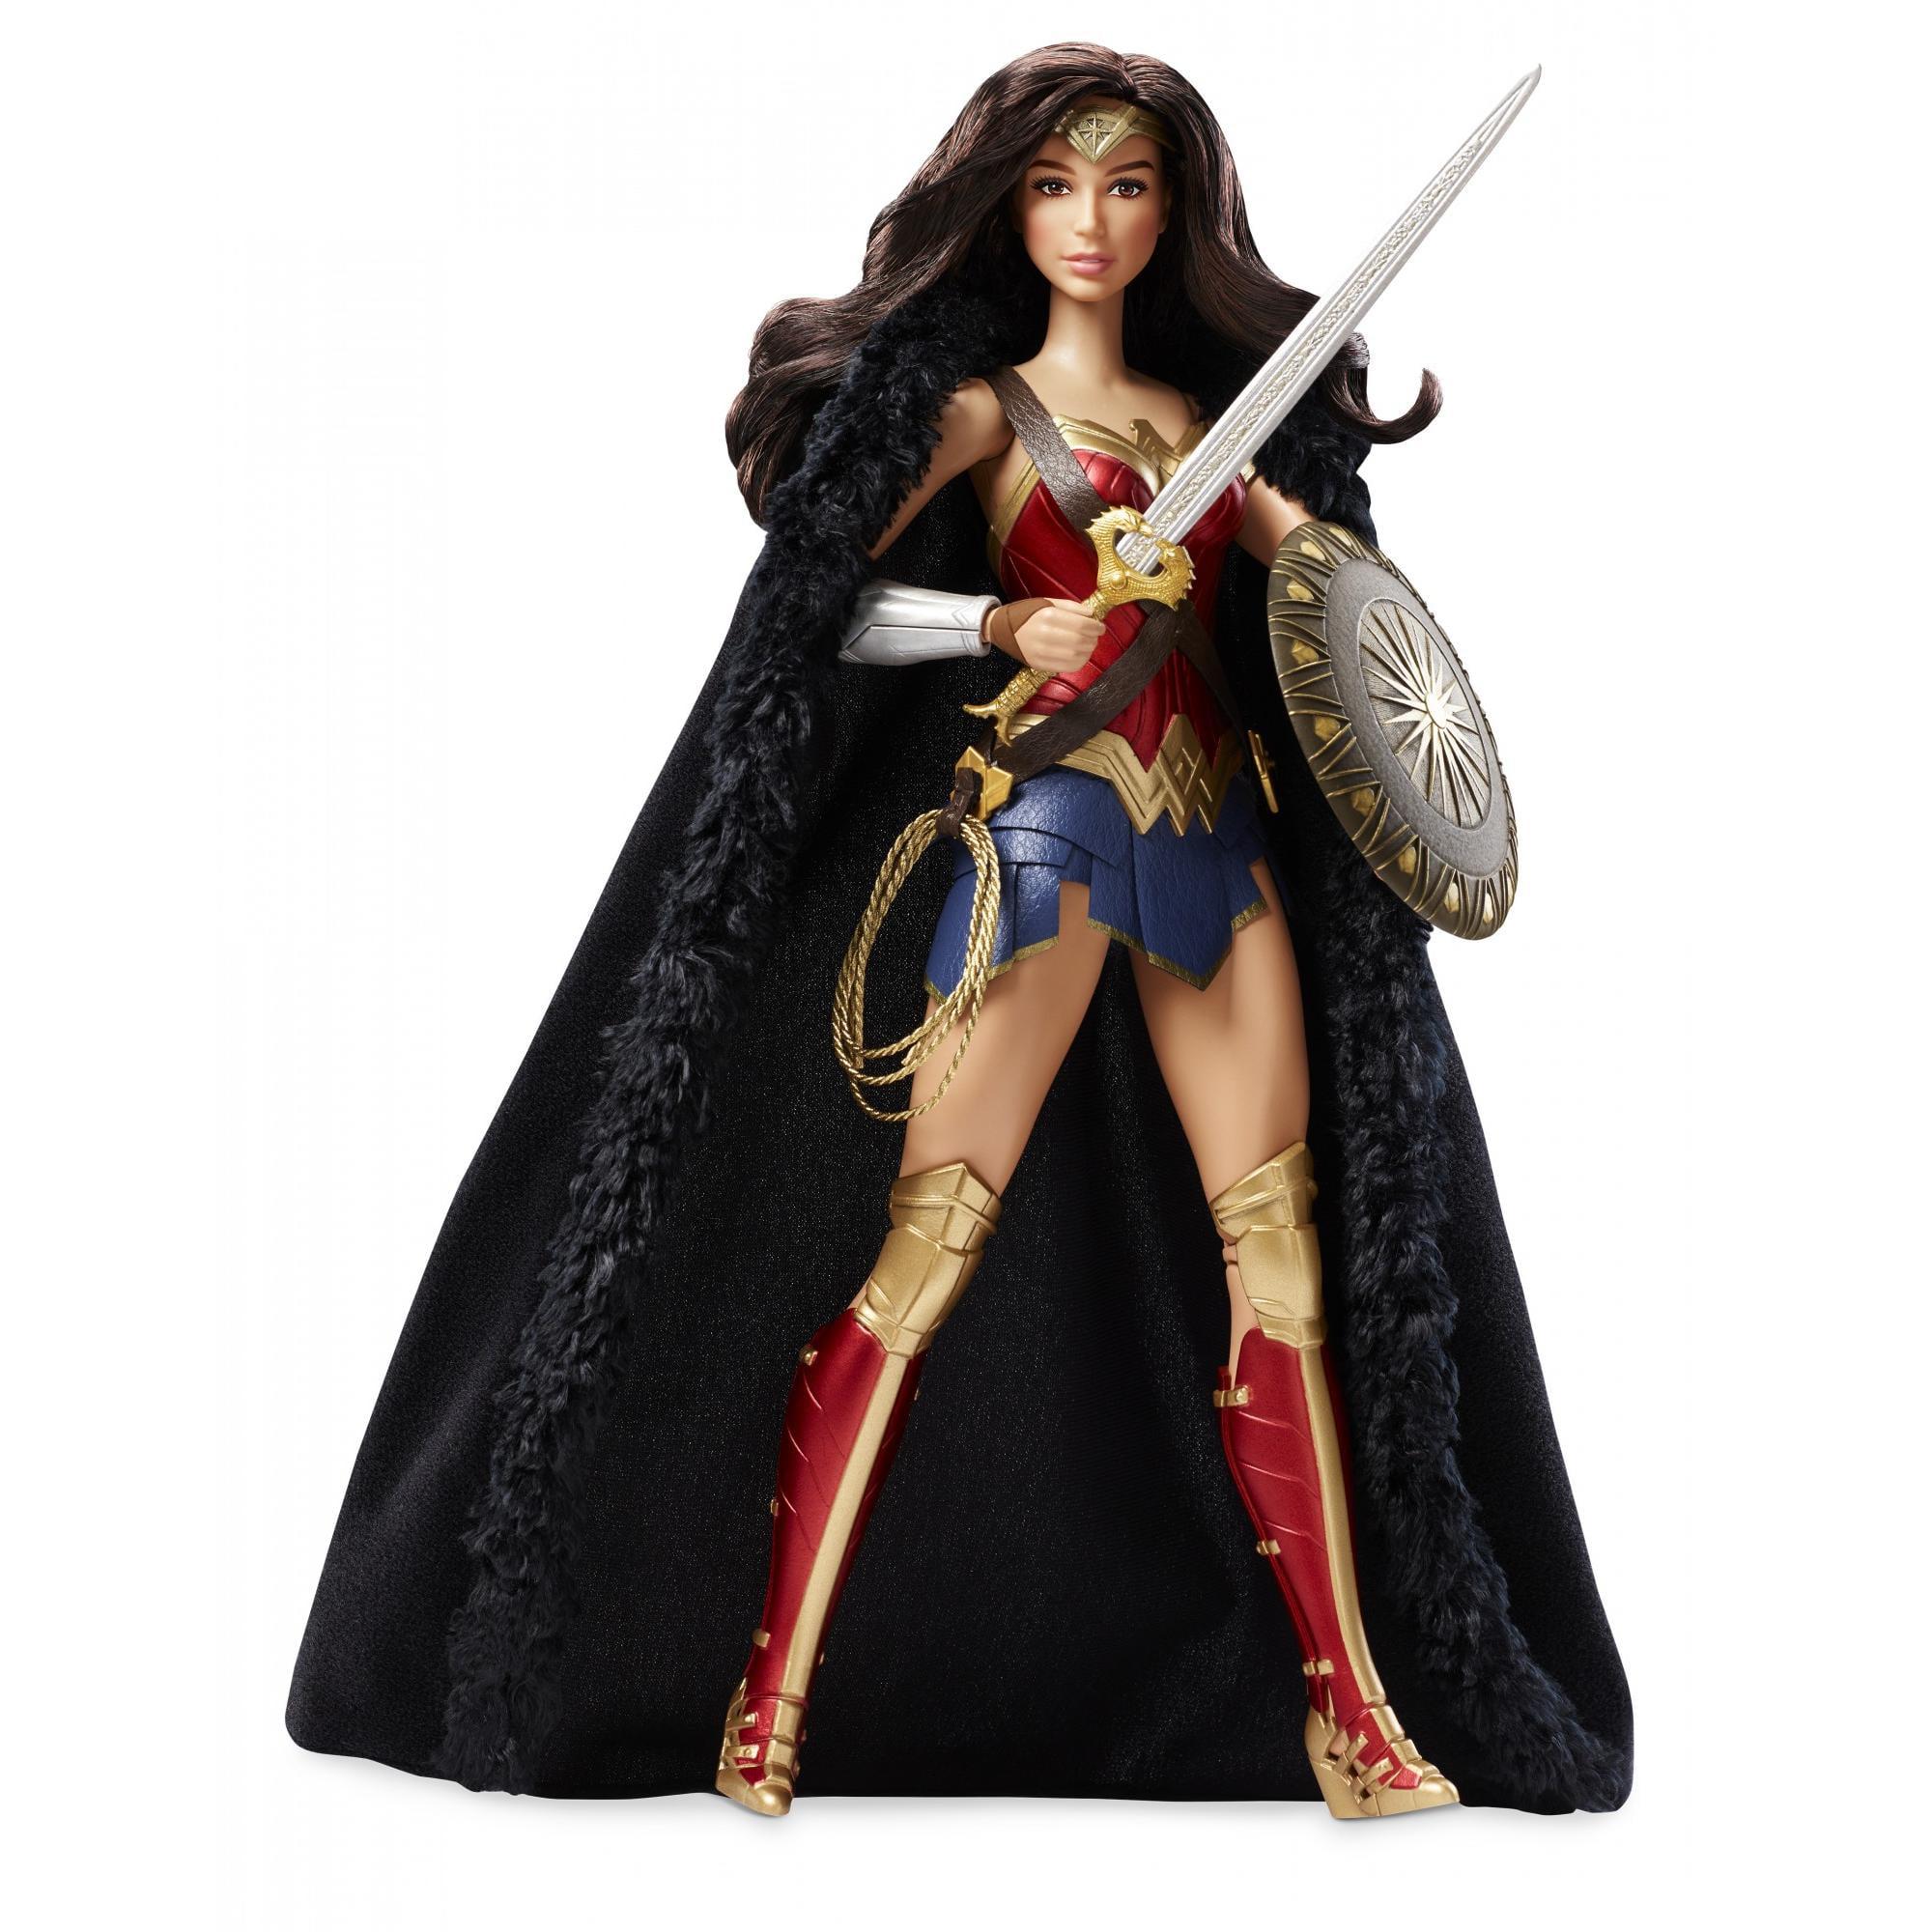 Barbie Wonder Woman Doll by Barbie